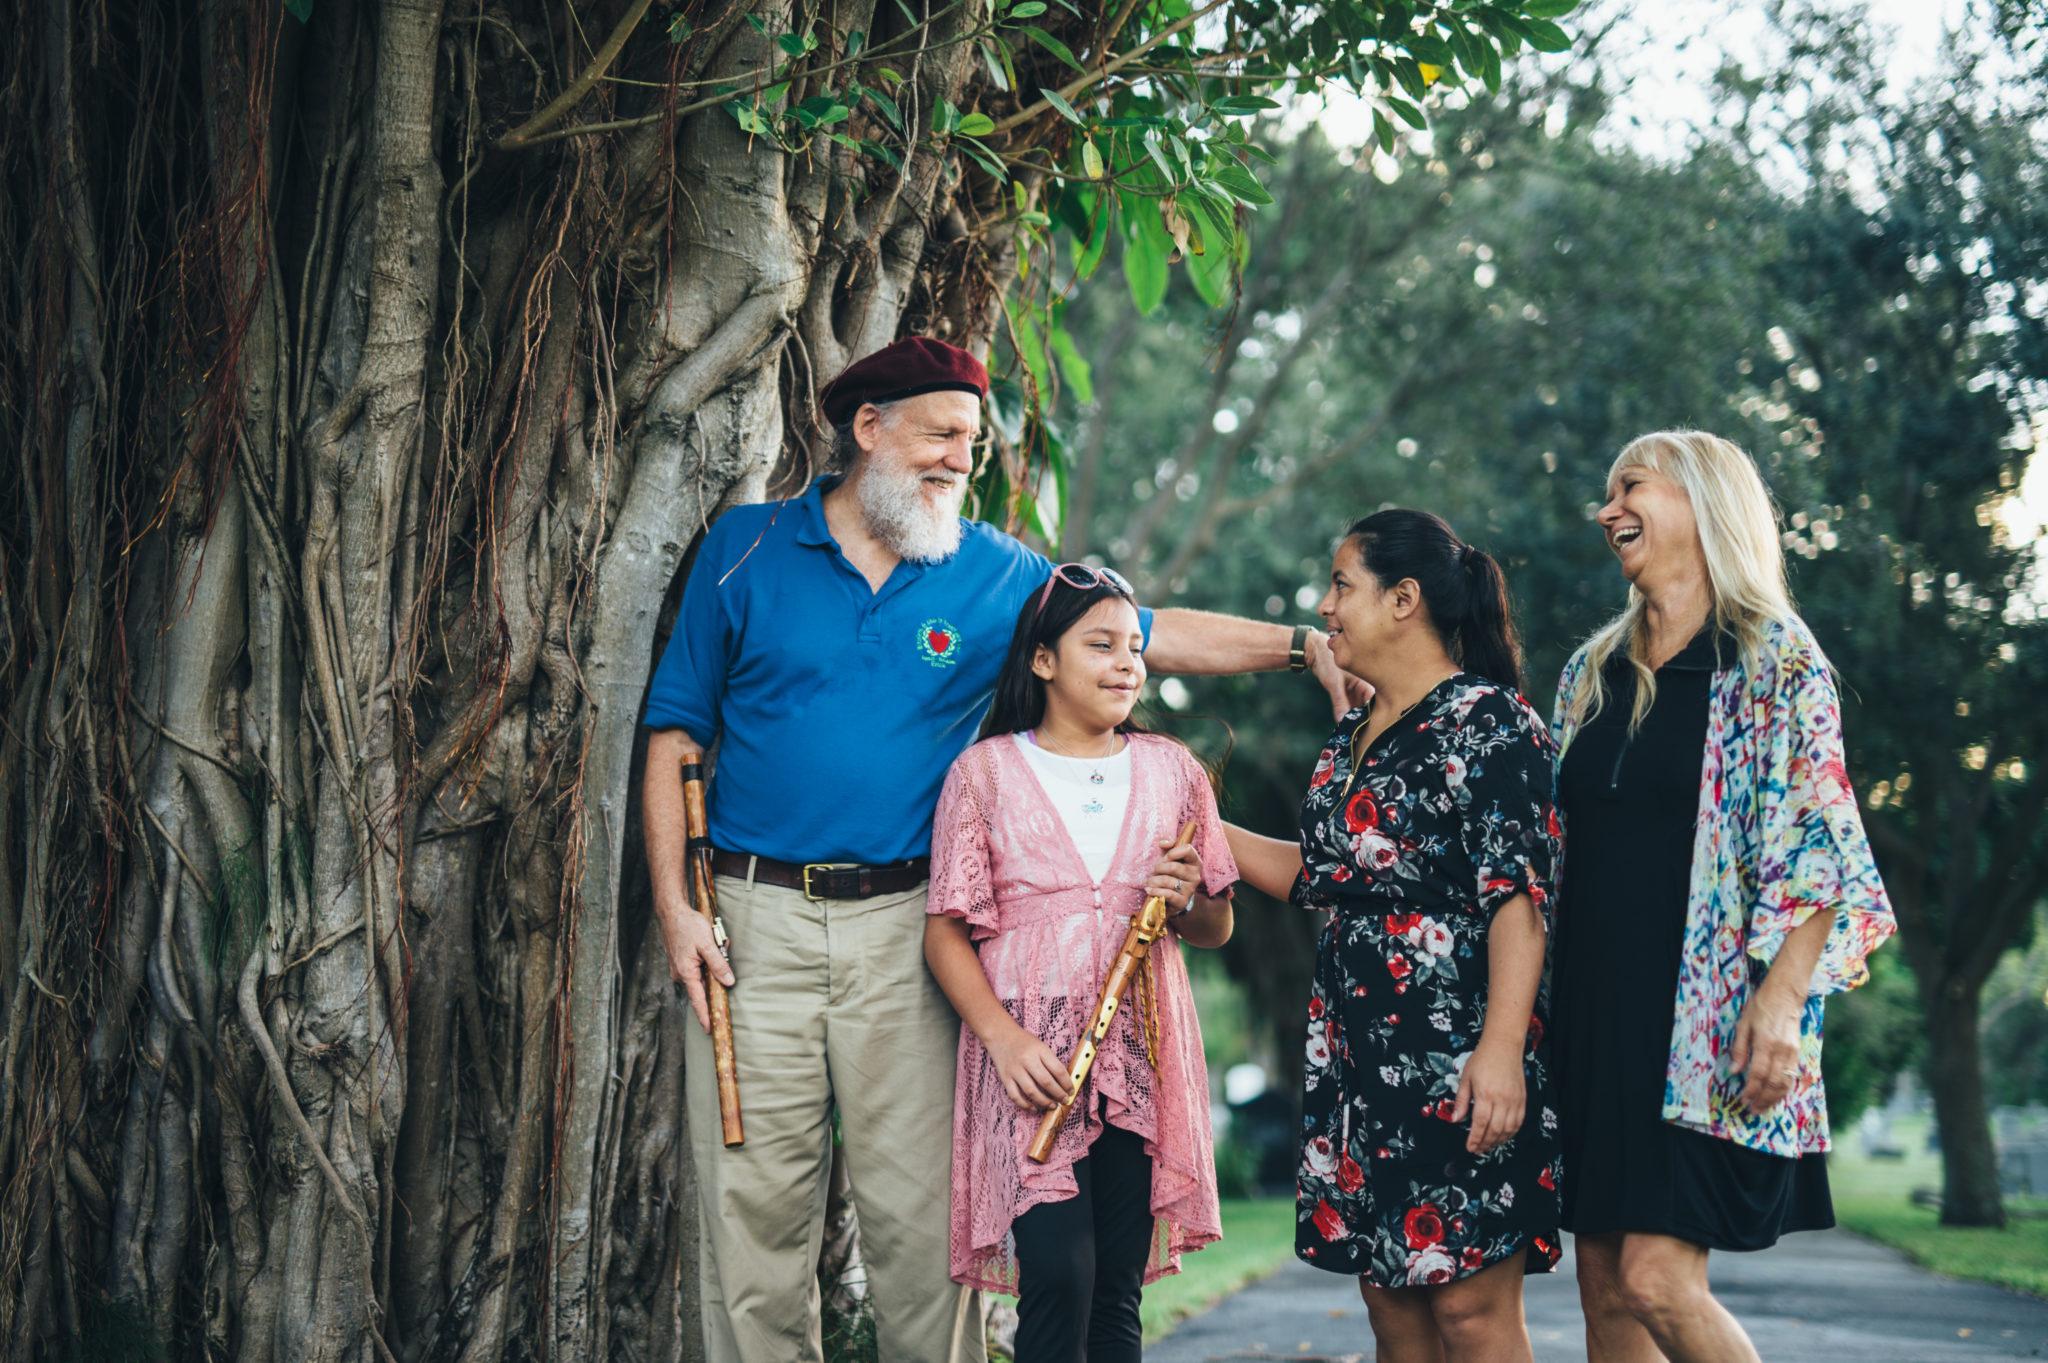 Fort Lauderdale based nonprofit